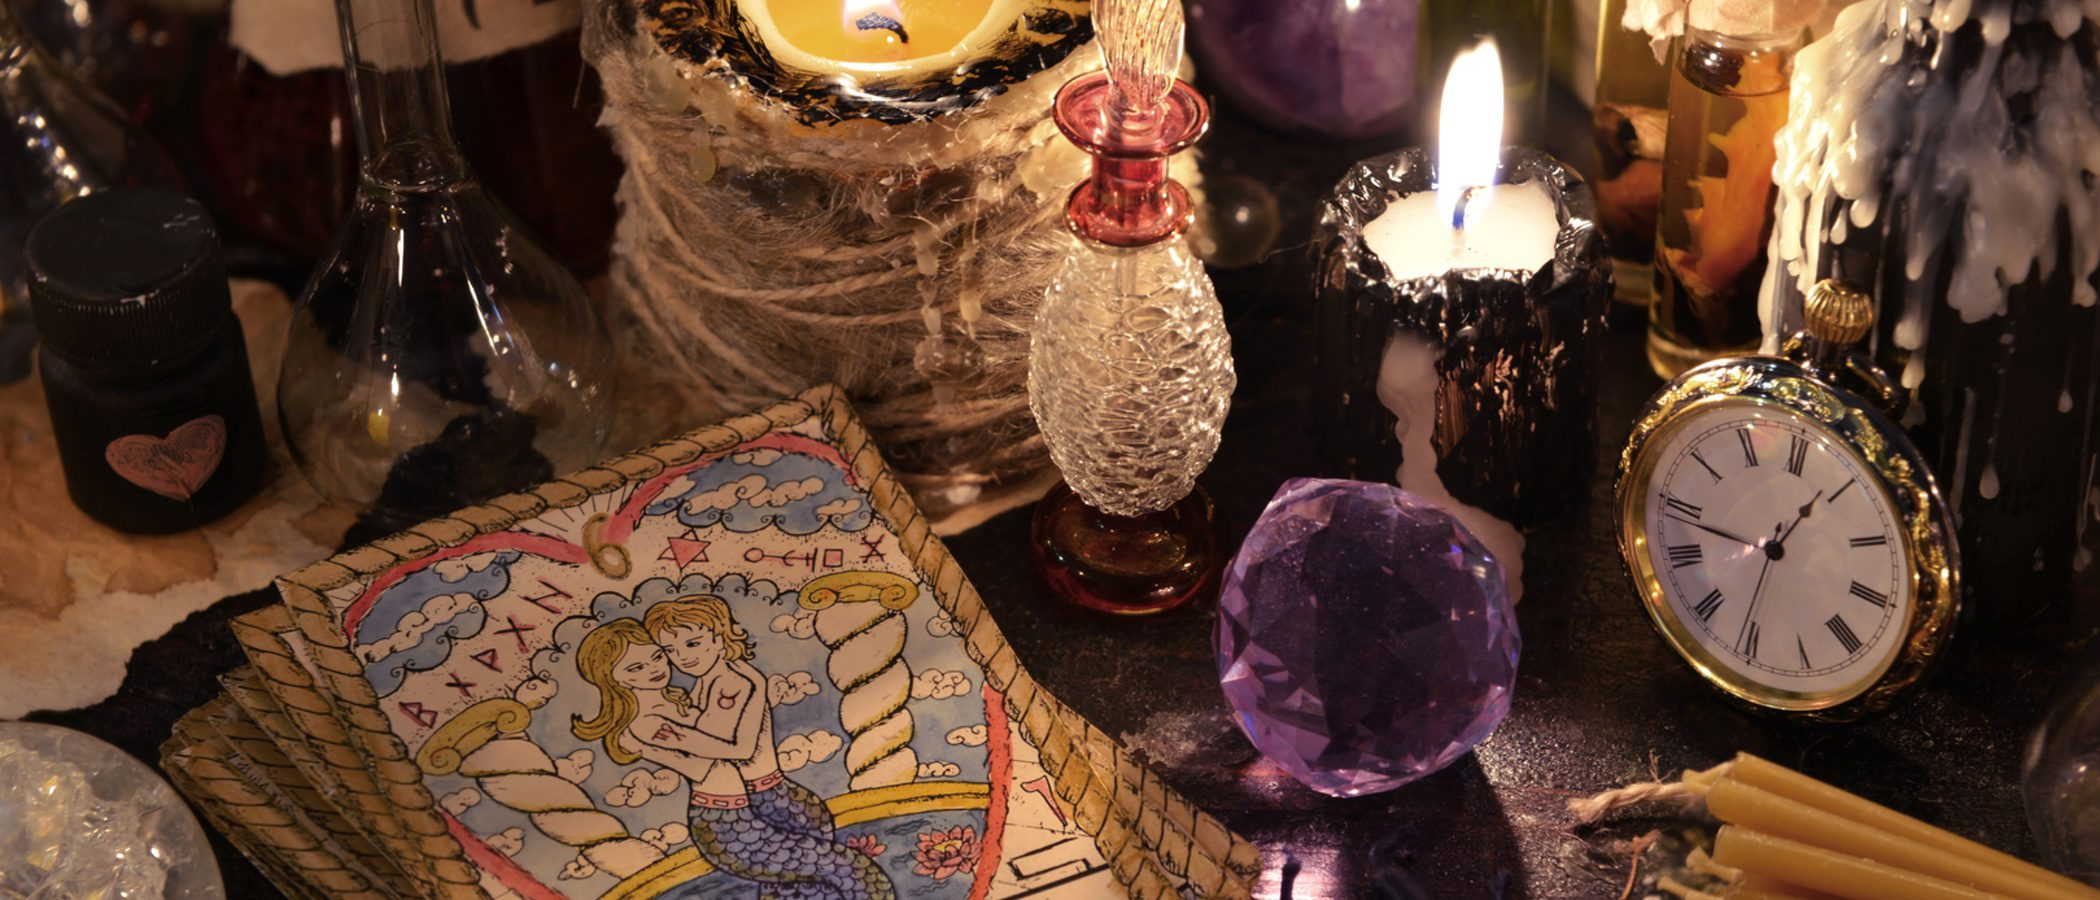 4 Rituales para Halloween que no te imaginas que podrían existir